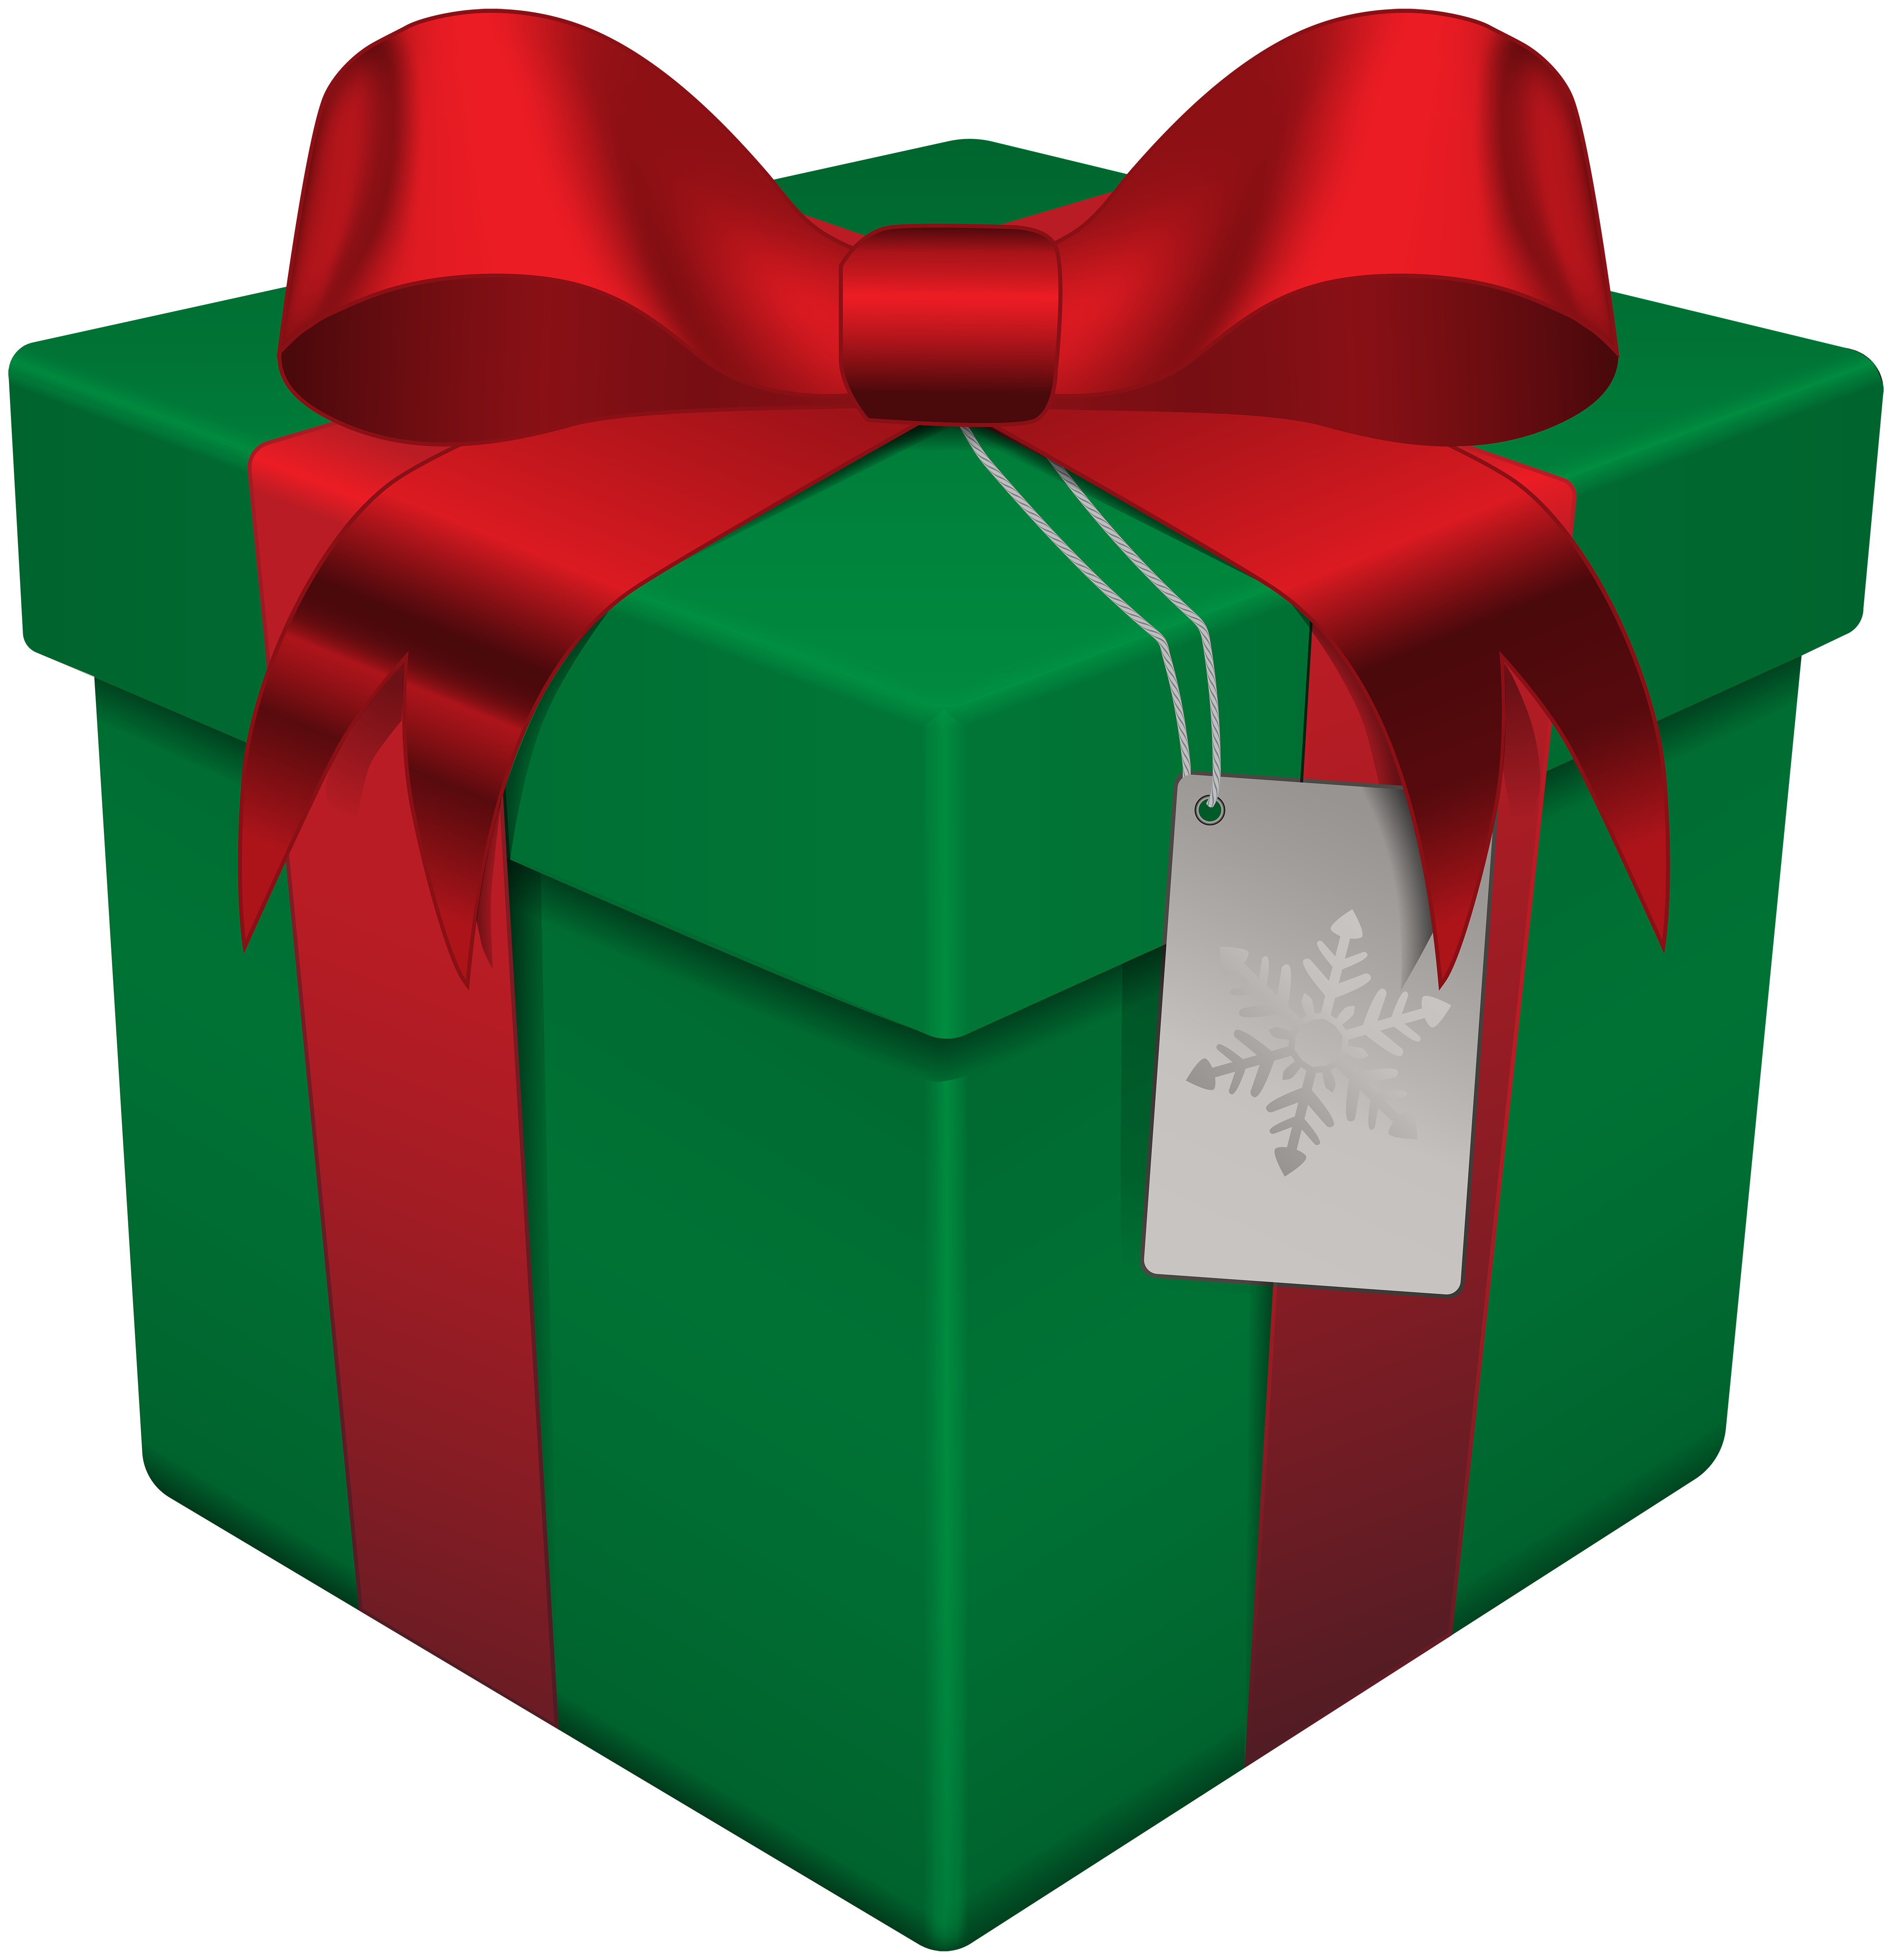 4827x5000 48 Gift Box Clipart, Gift Box Green Transparent Png Clip Art